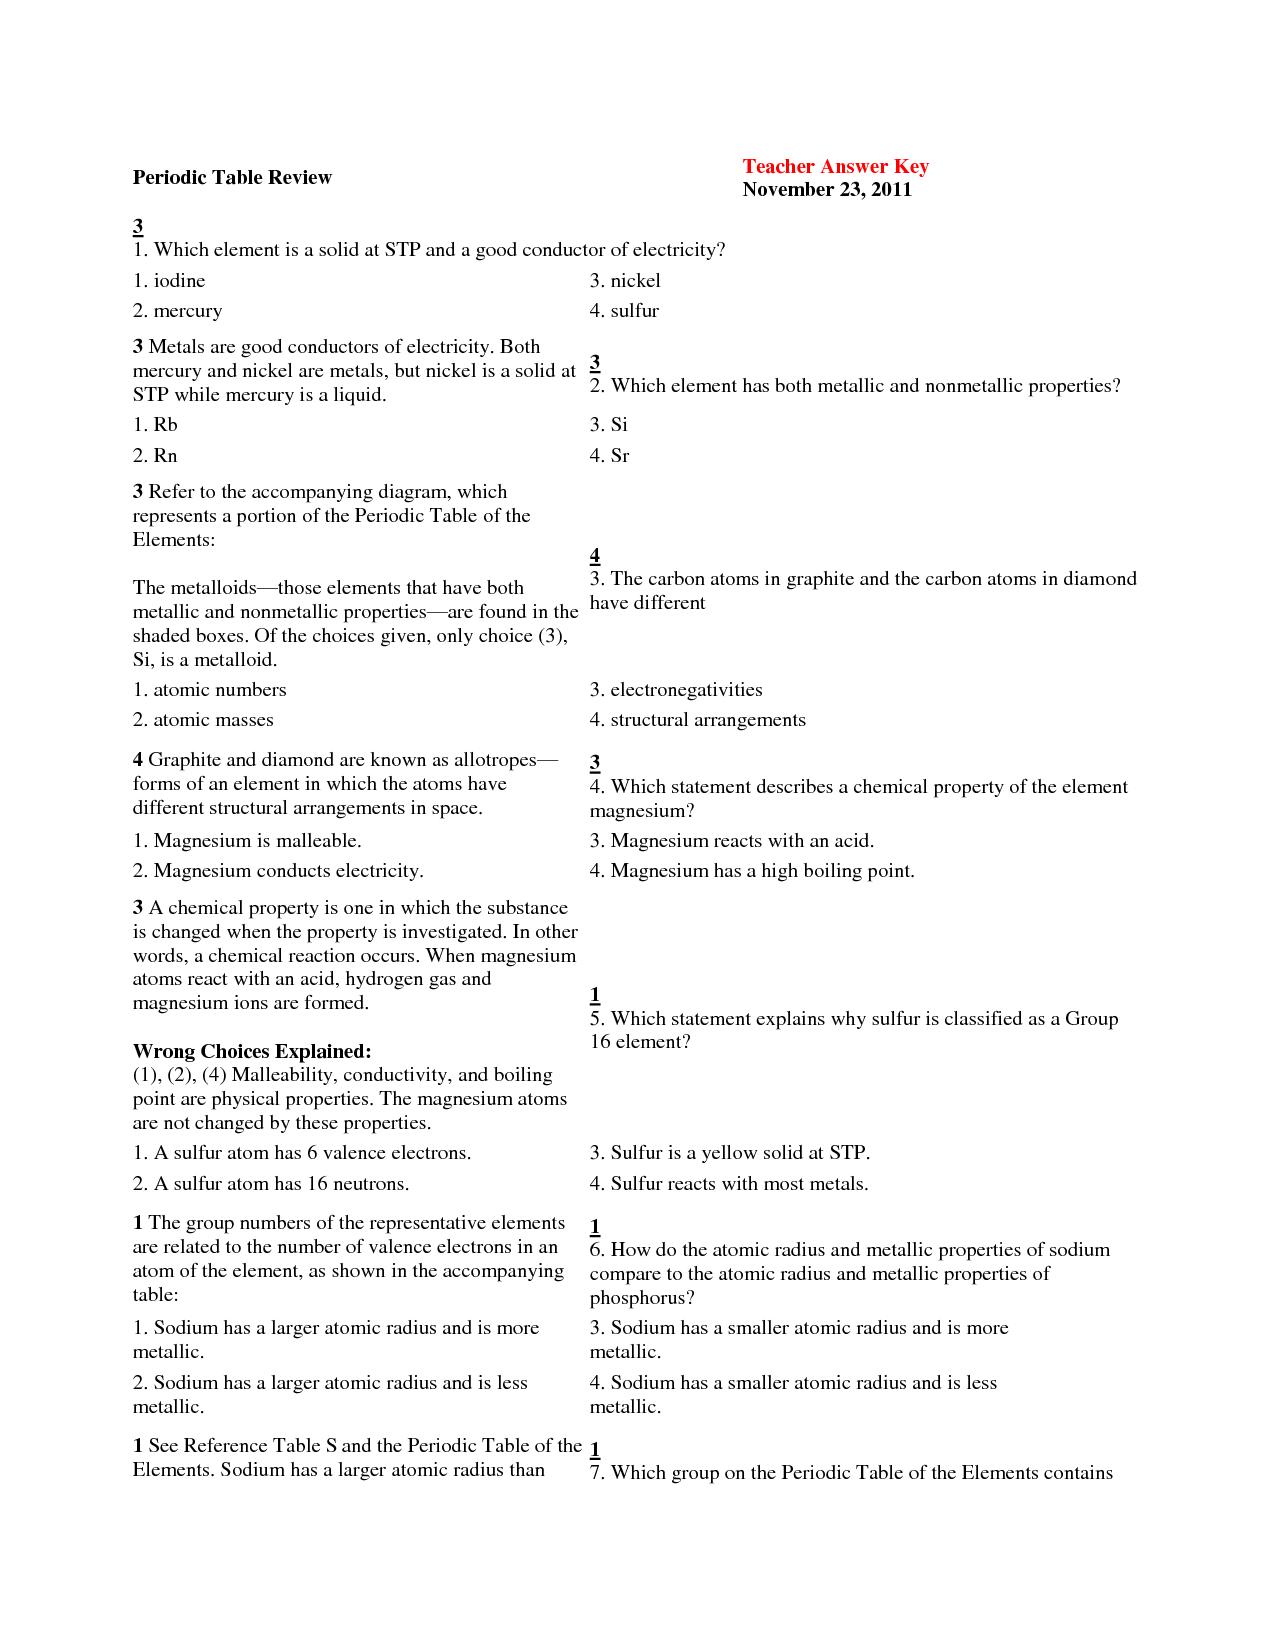 Element Puns Worksheet Answers